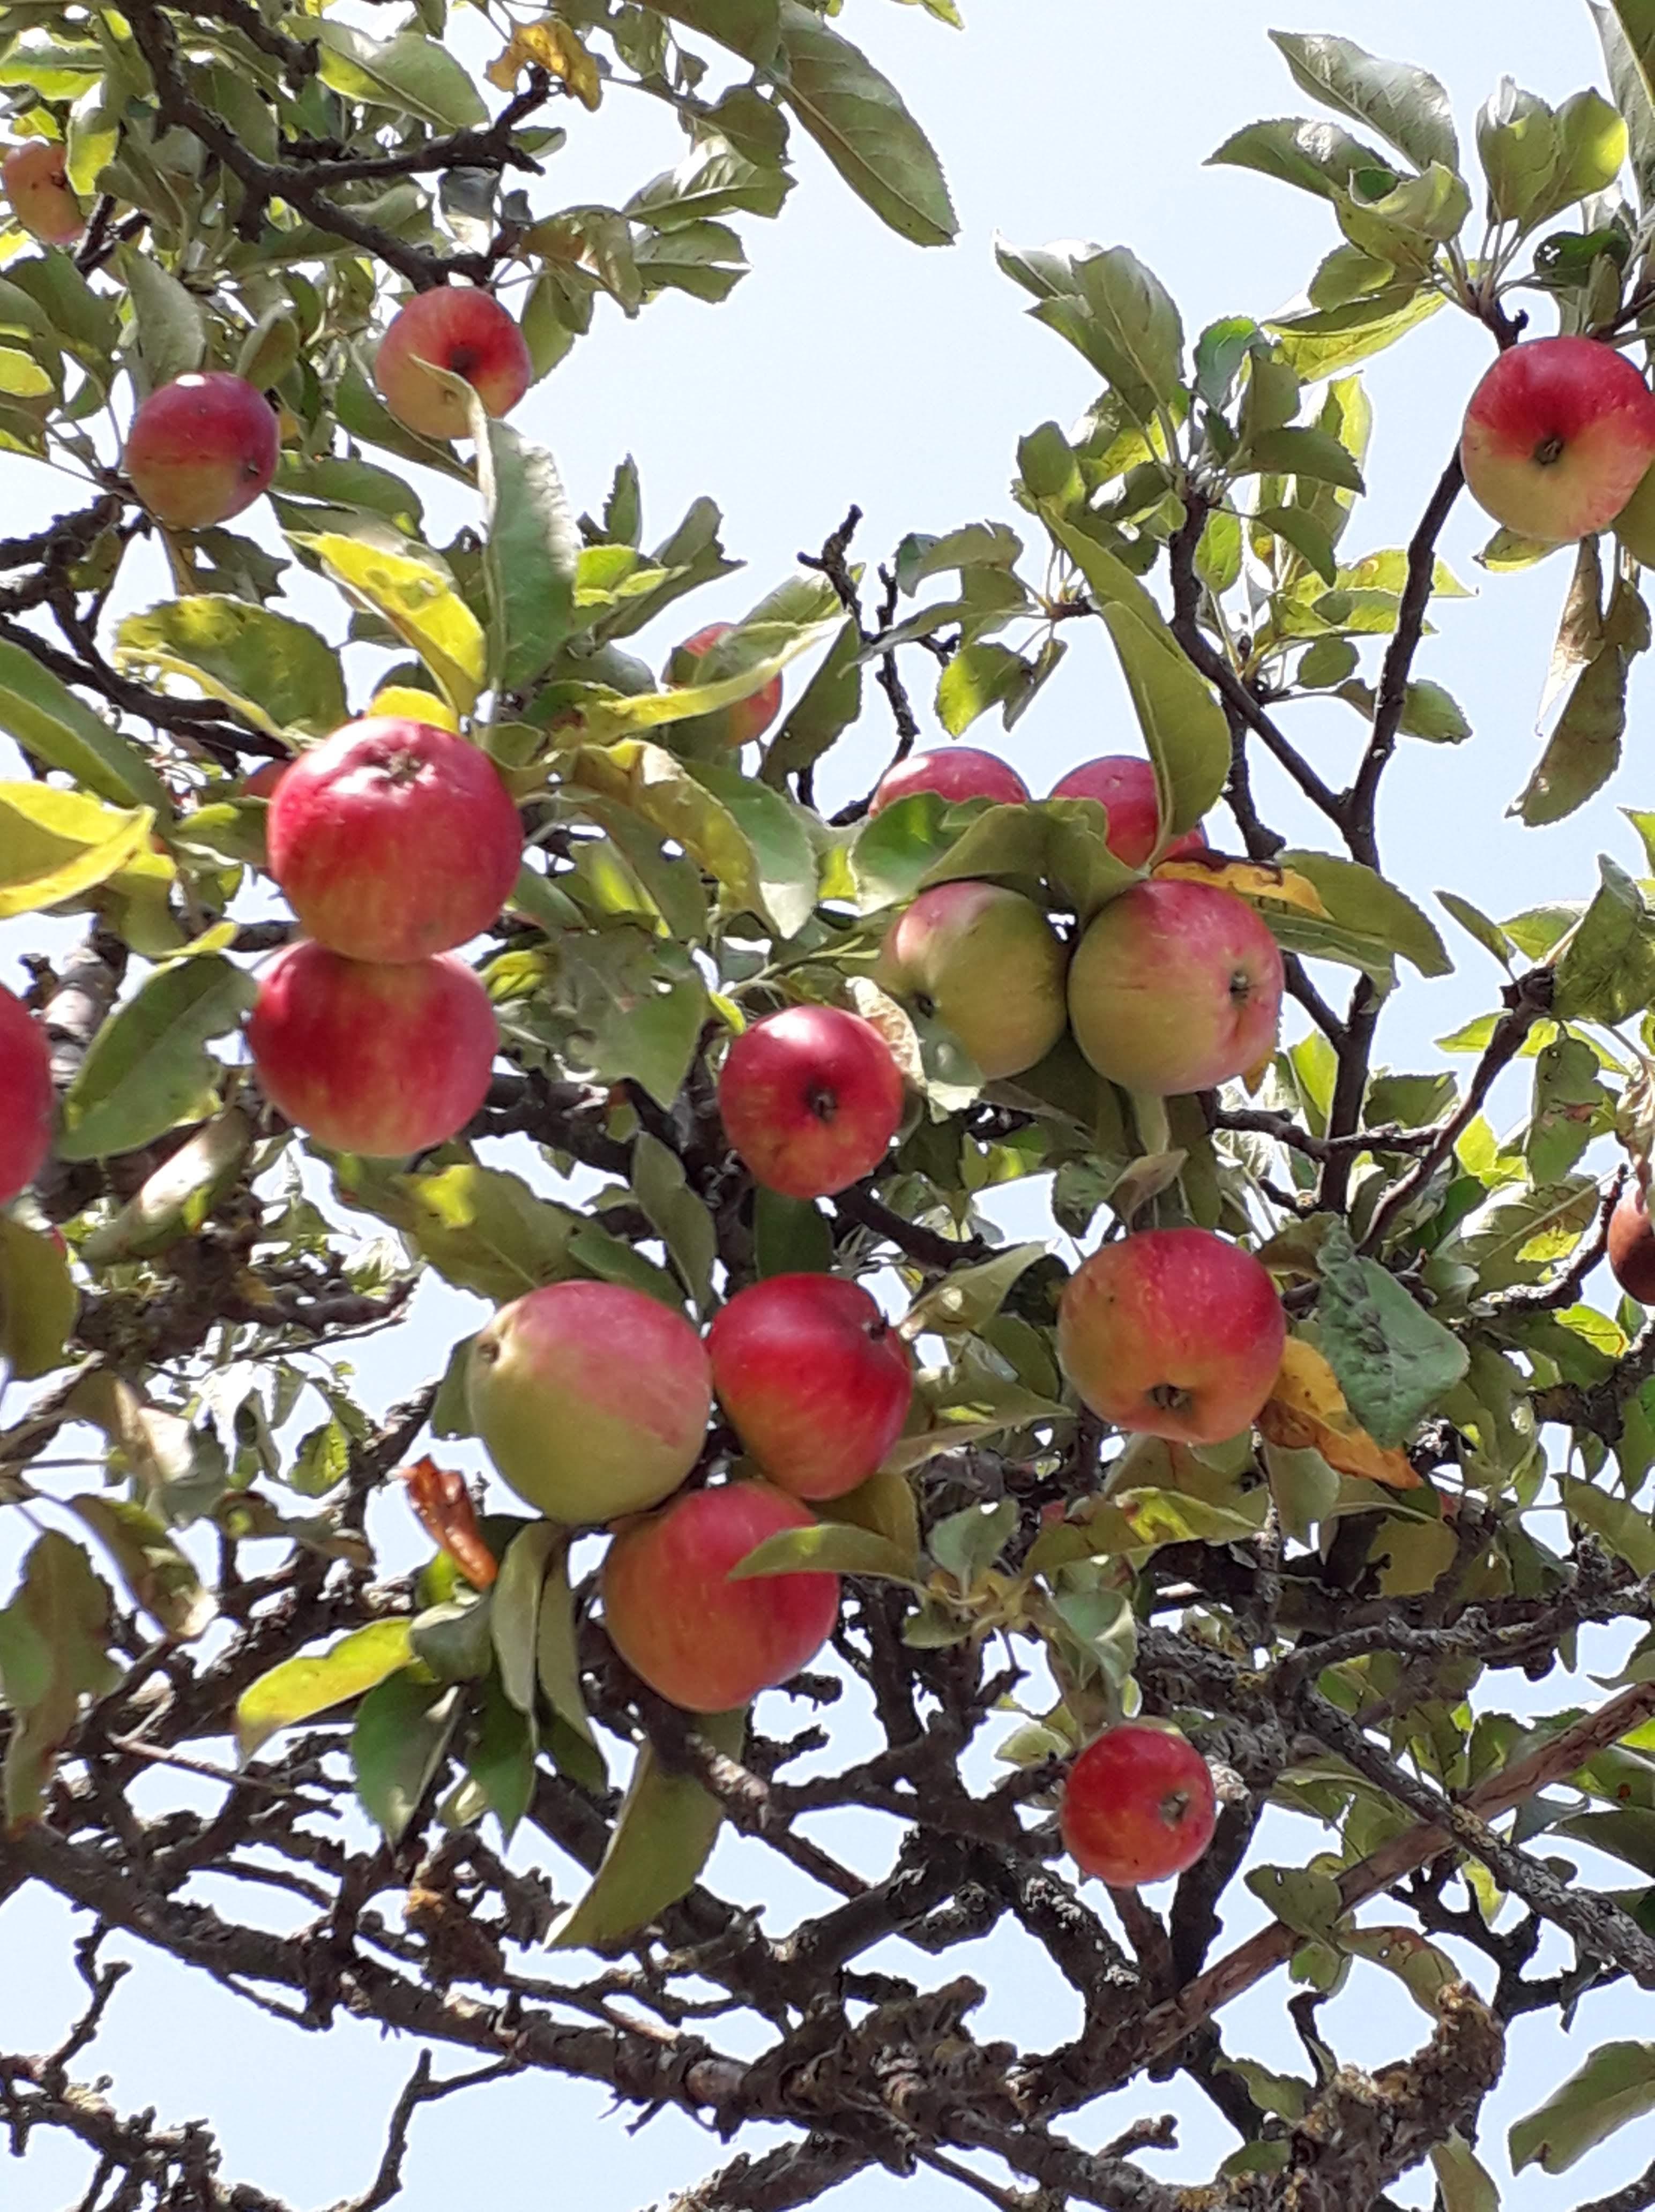 Best individual homegrown fruit or veg winner - Seeds Project